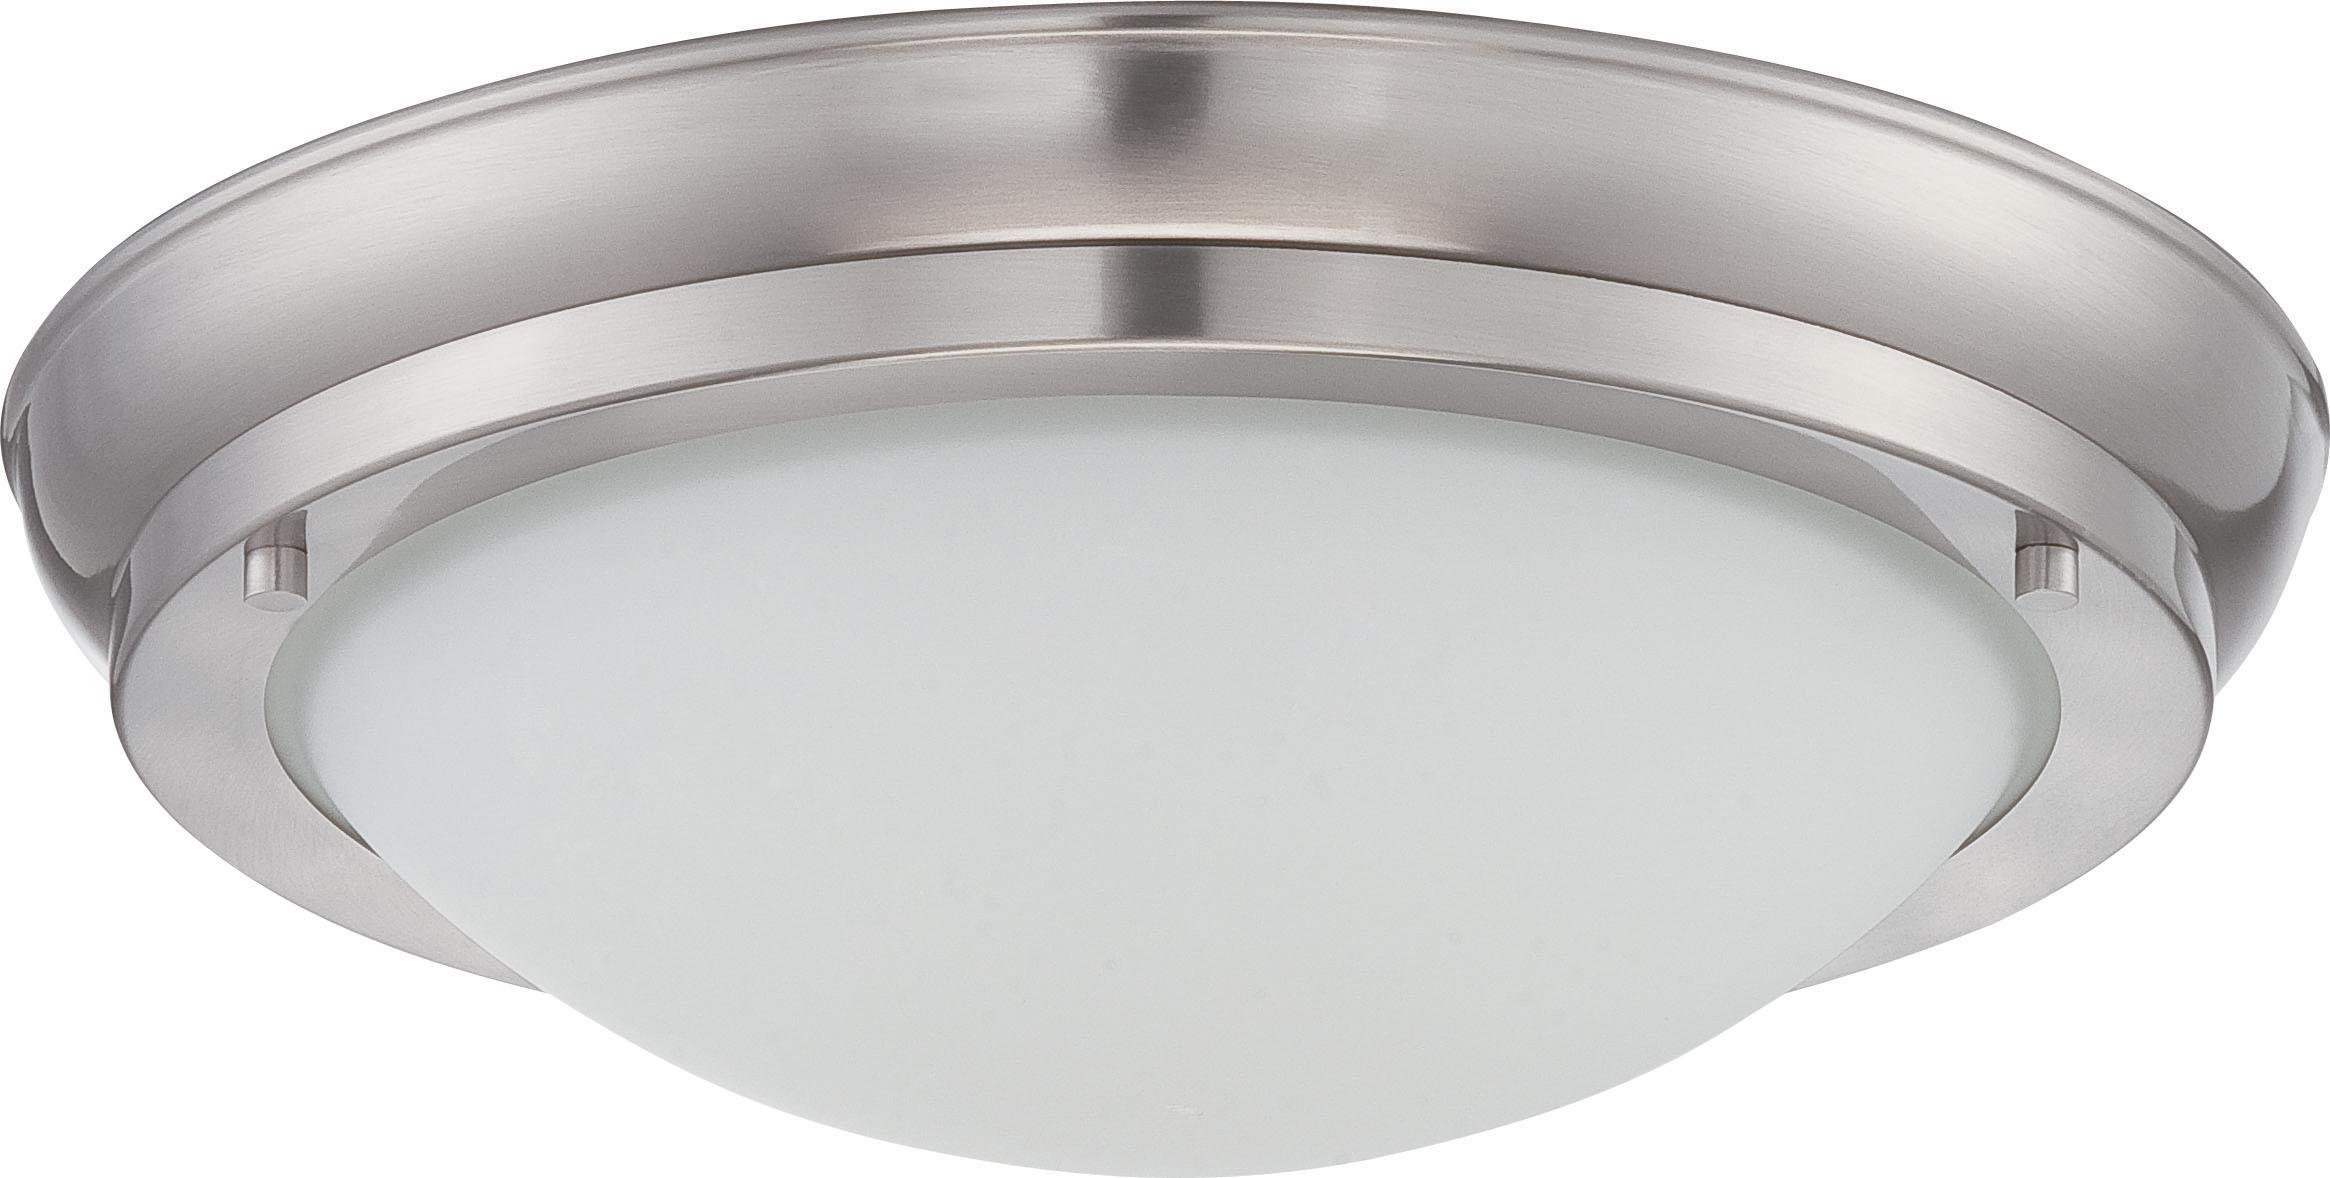 POKE MED LED FLUSH FIXT Brushed Nickel